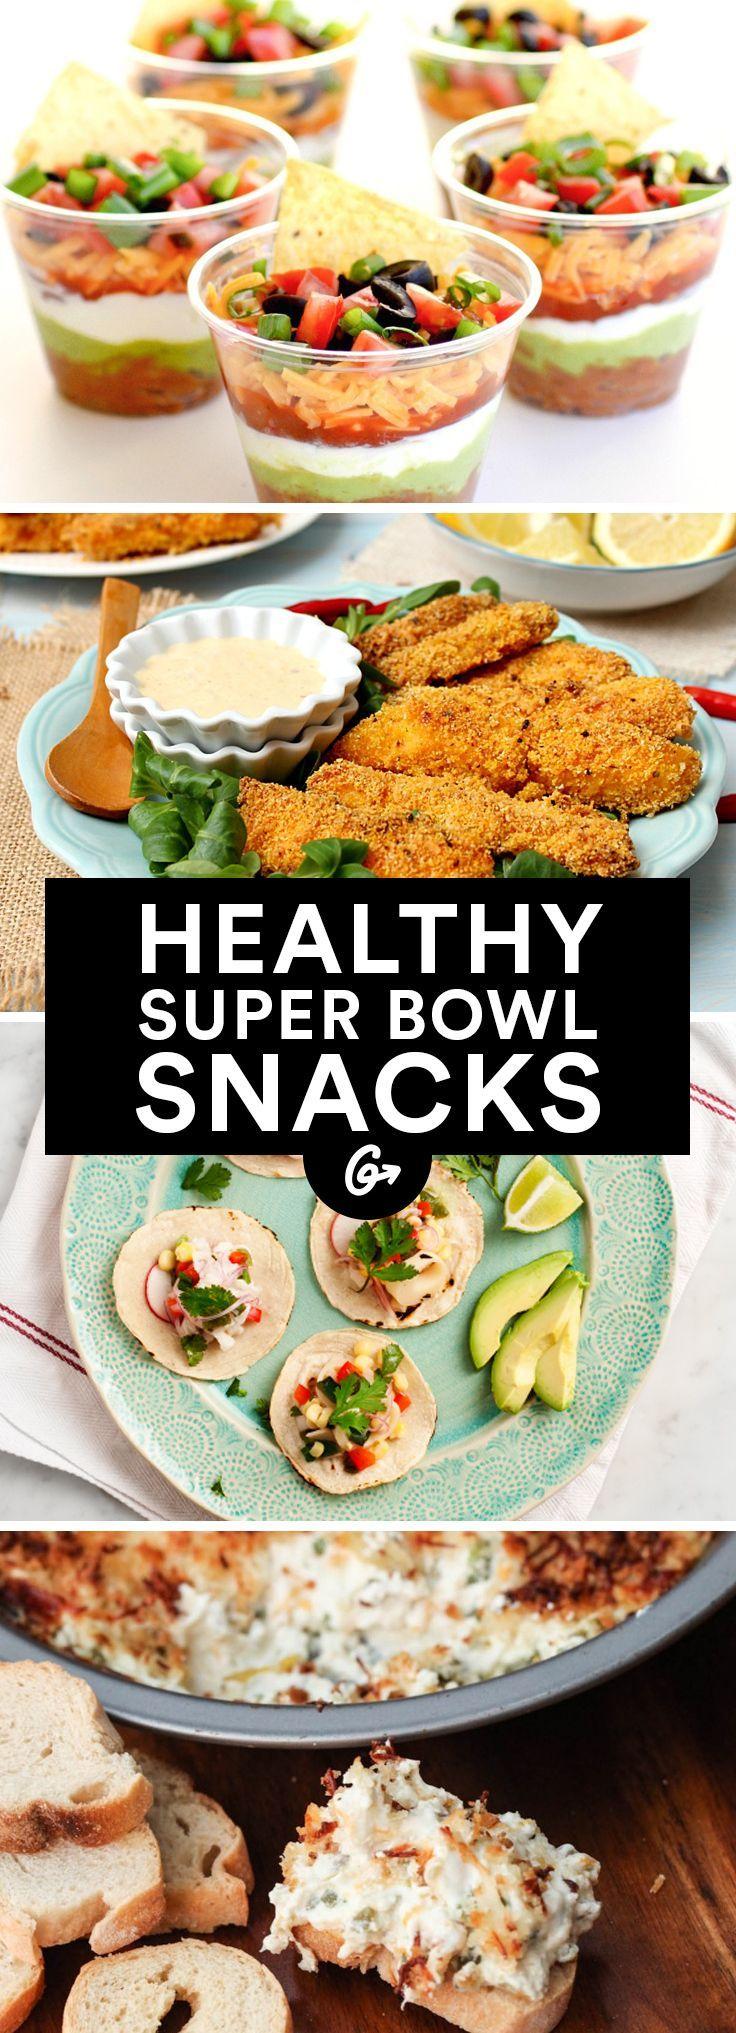 41 Guilt-Free Super Bowl Snacks #healthy #superbowl #recipes http://greatist.com/health/super-bowl-recipes-snacks